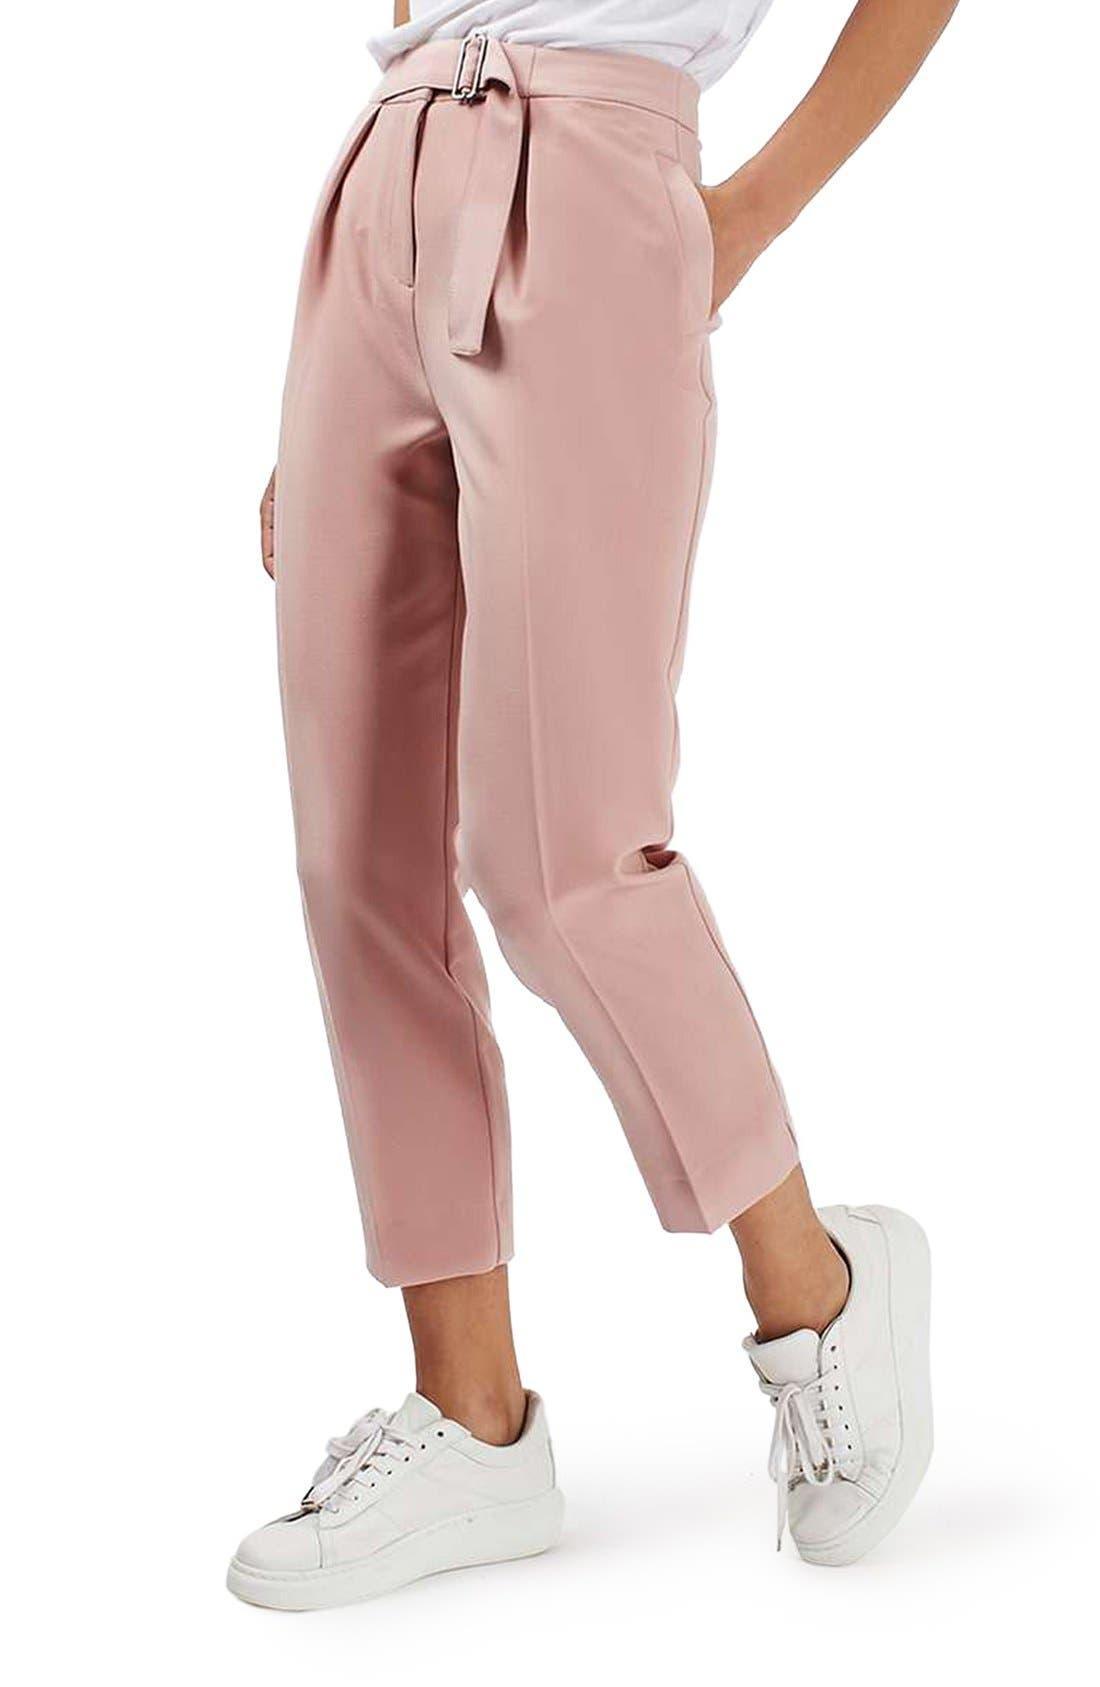 Alternate Image 1 Selected - Topshop Slider Utility Peg Trousers (Regular & Petite)